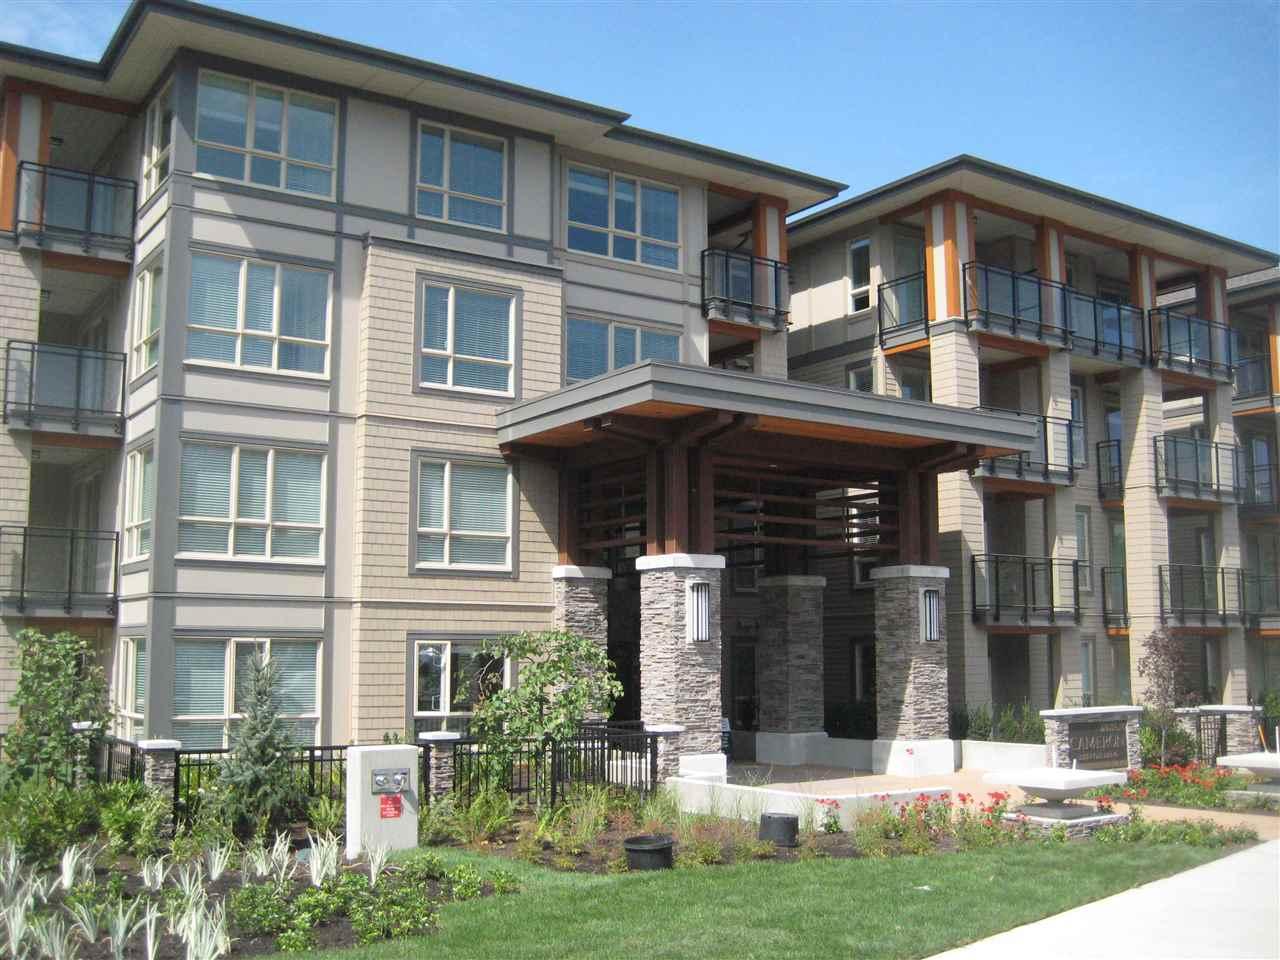 Condo Apartment at 325 3399 NOEL DRIVE, Unit 325, Burnaby North, British Columbia. Image 1